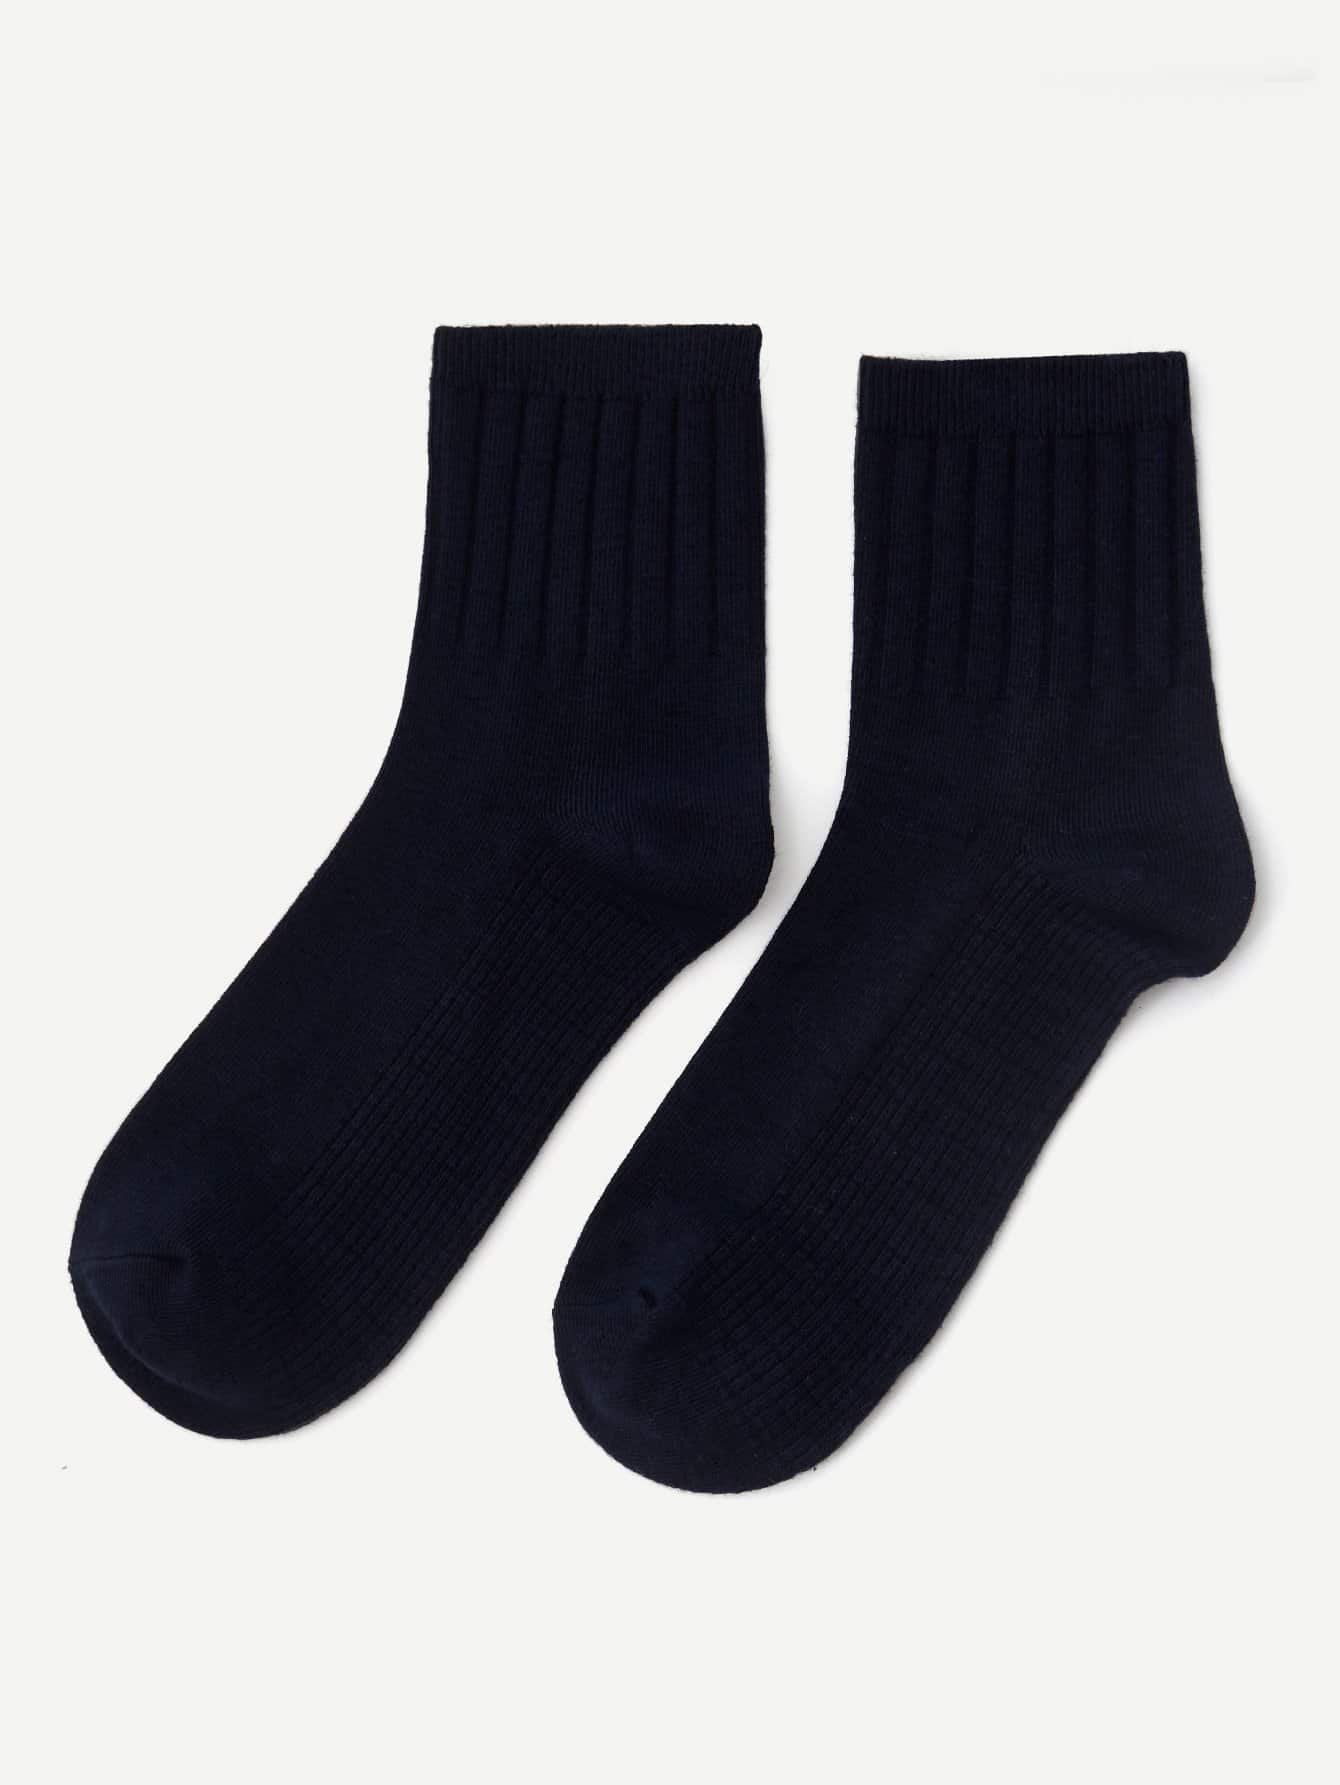 Купить 1 пара носки до лодыжки для мужчин, null, SheIn